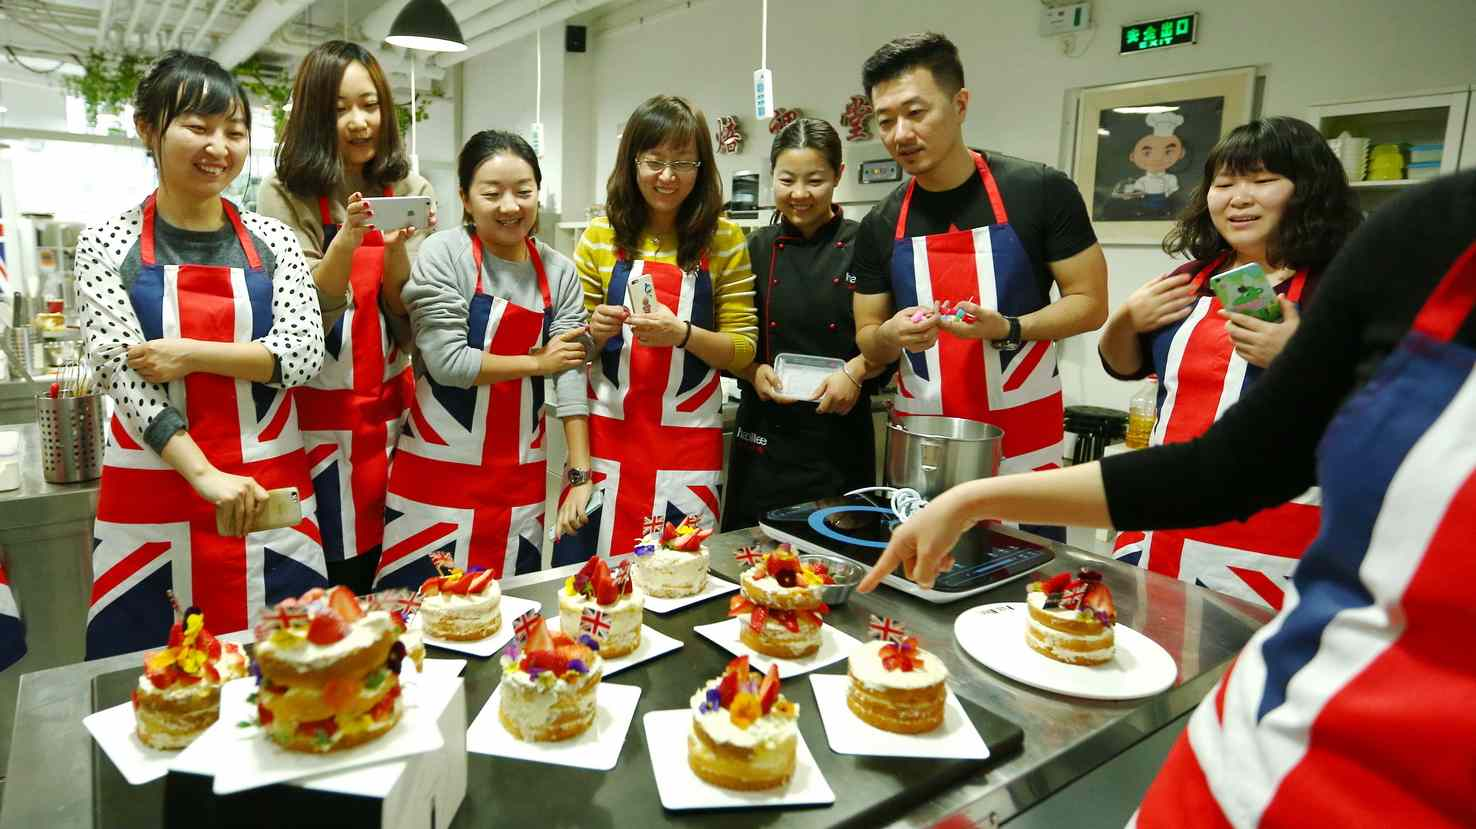 Leeds City Region holds Bake-Off in Beijing